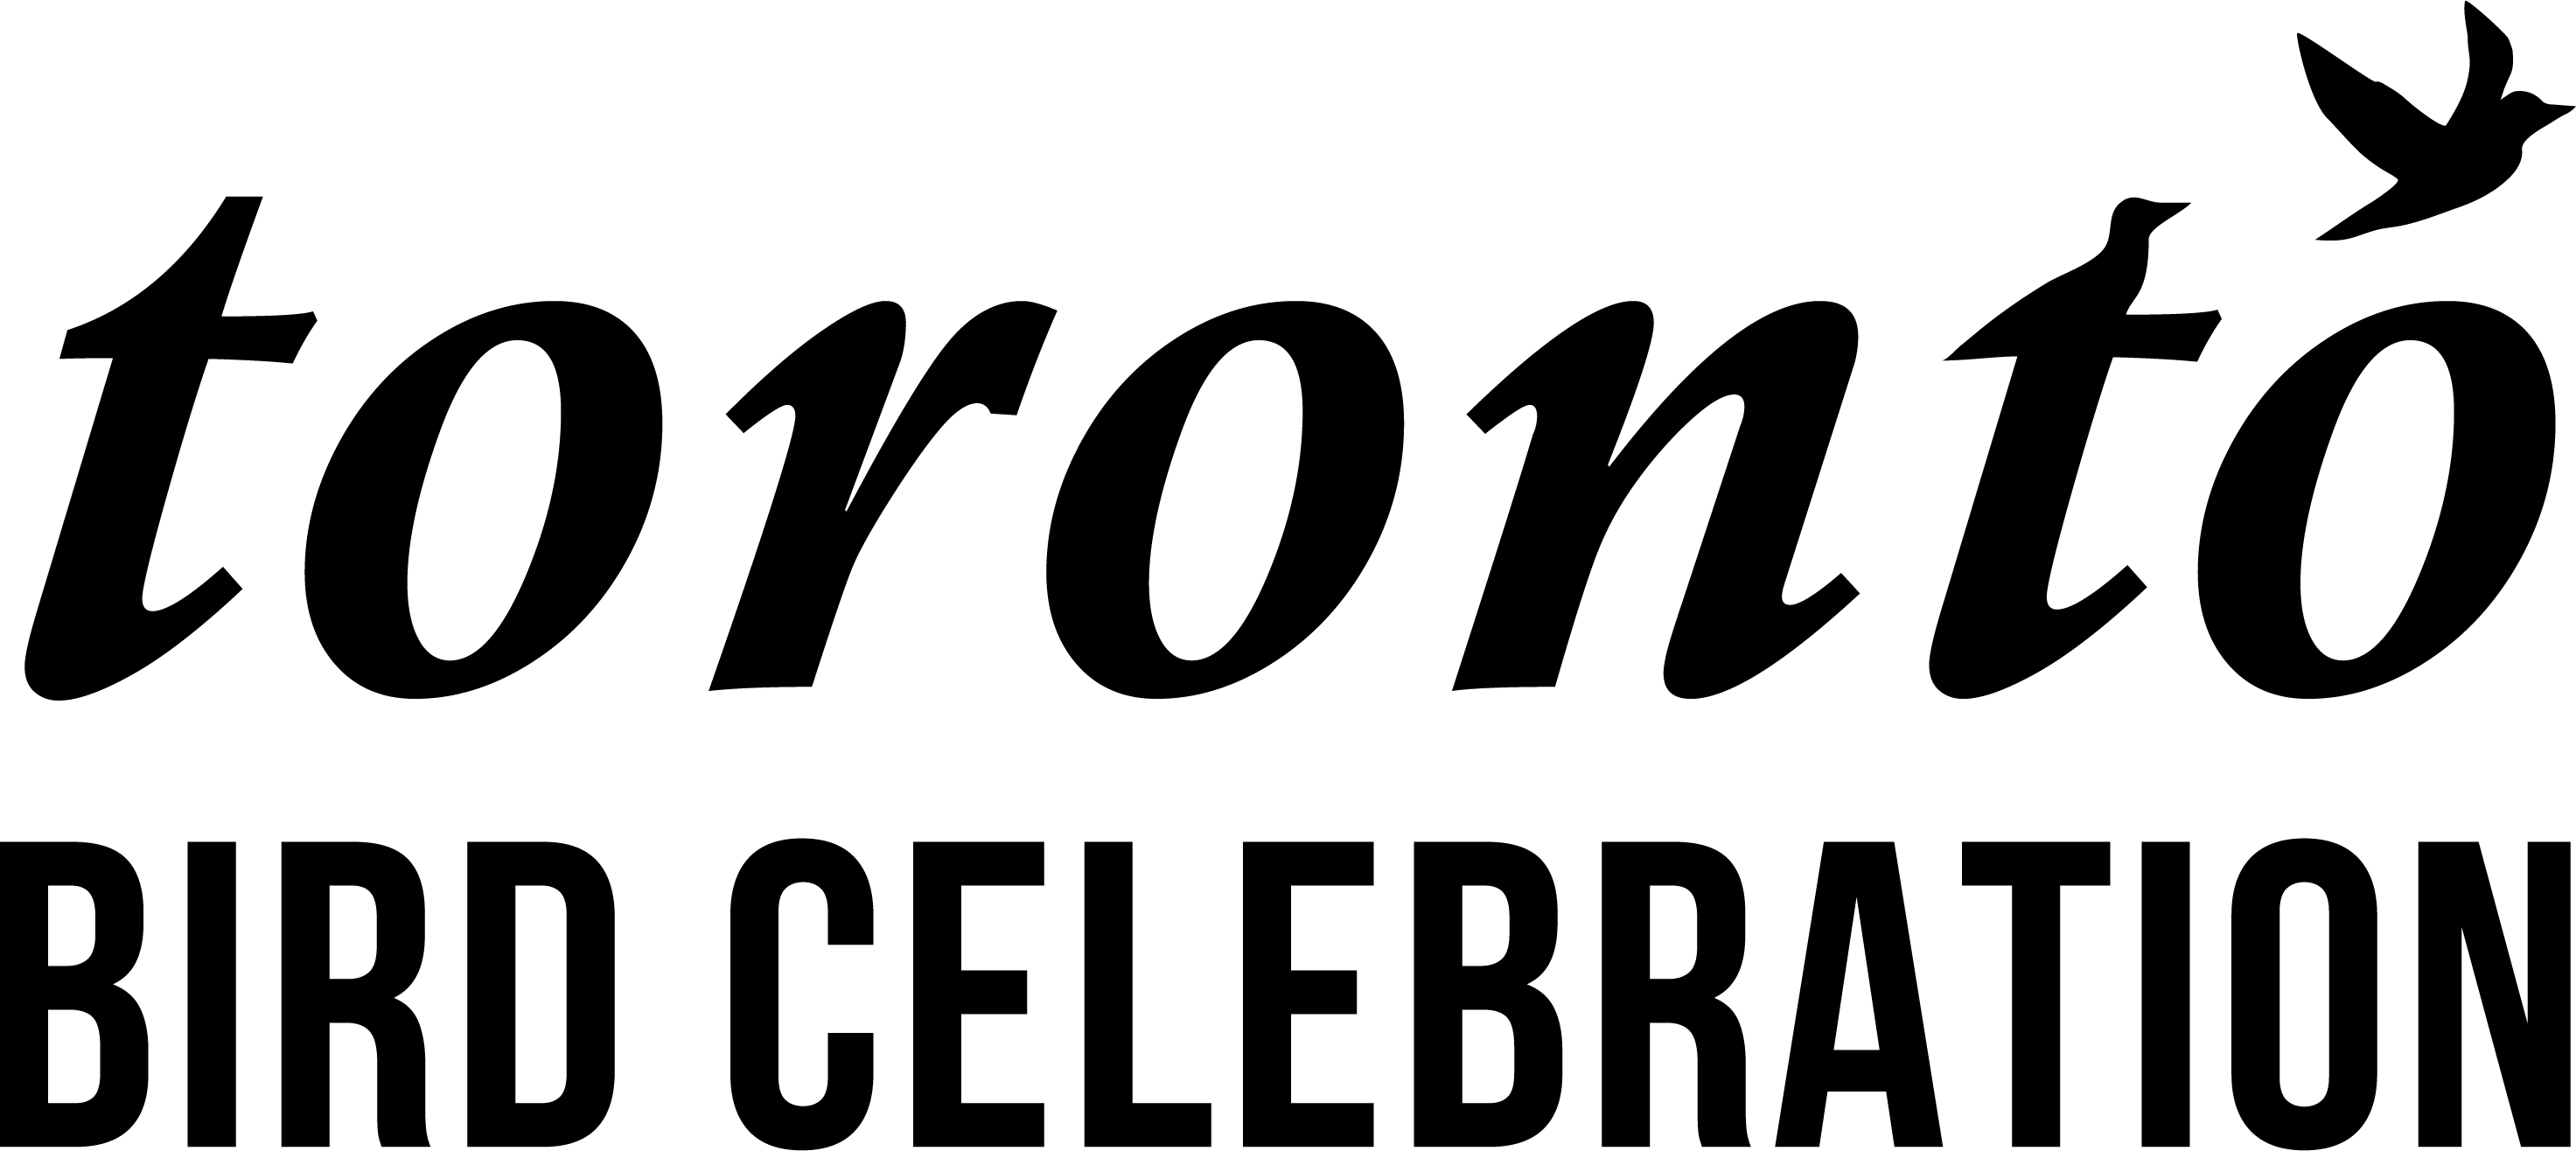 Toronto Bird Celebration wordmark